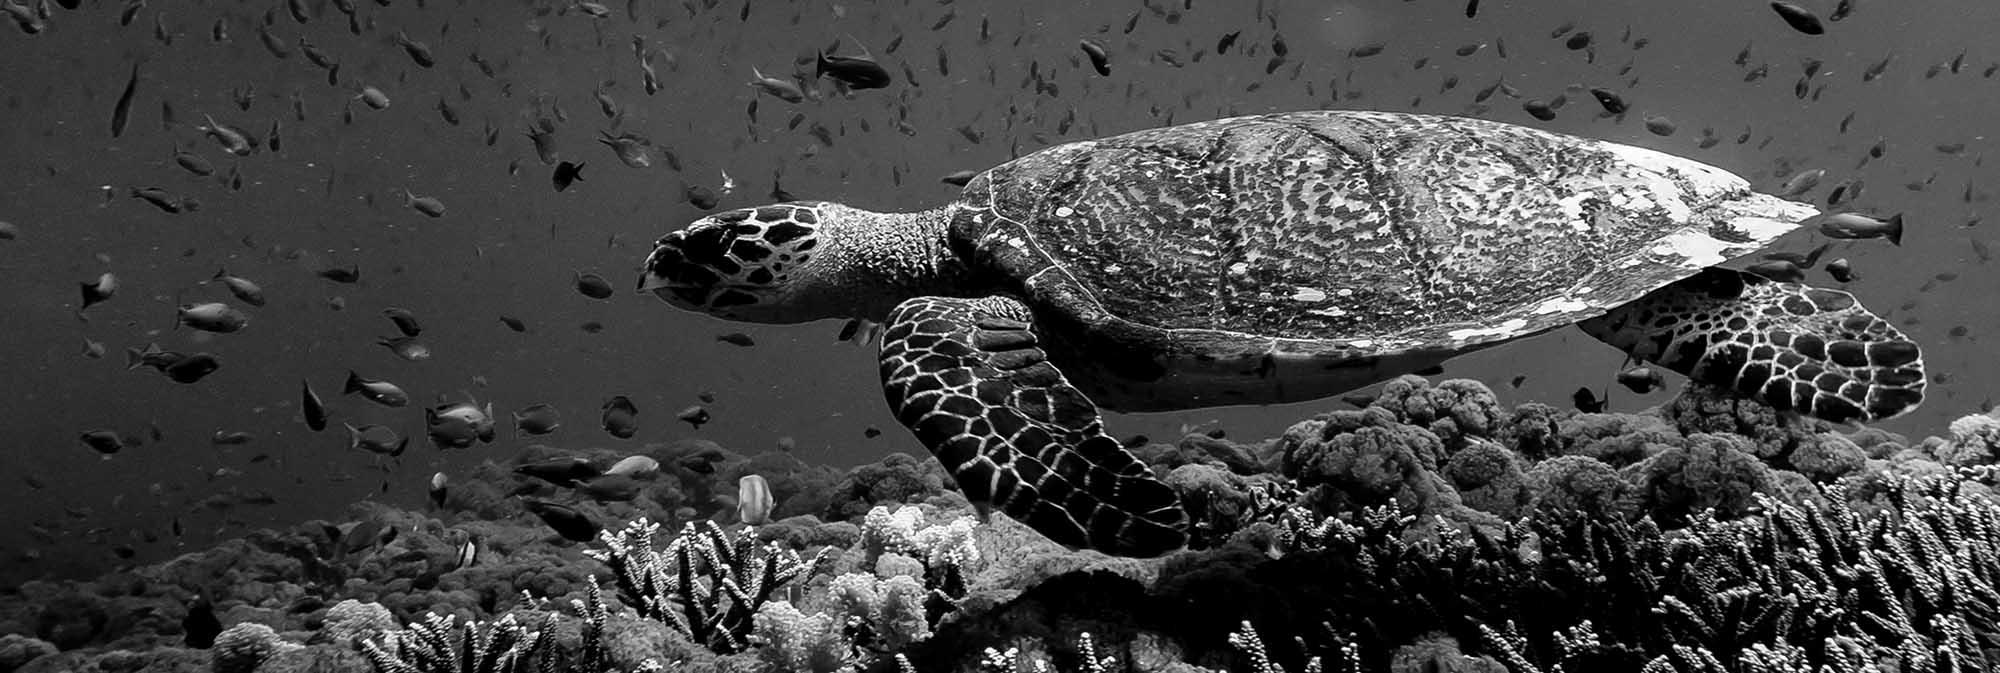 Turtle sliding header